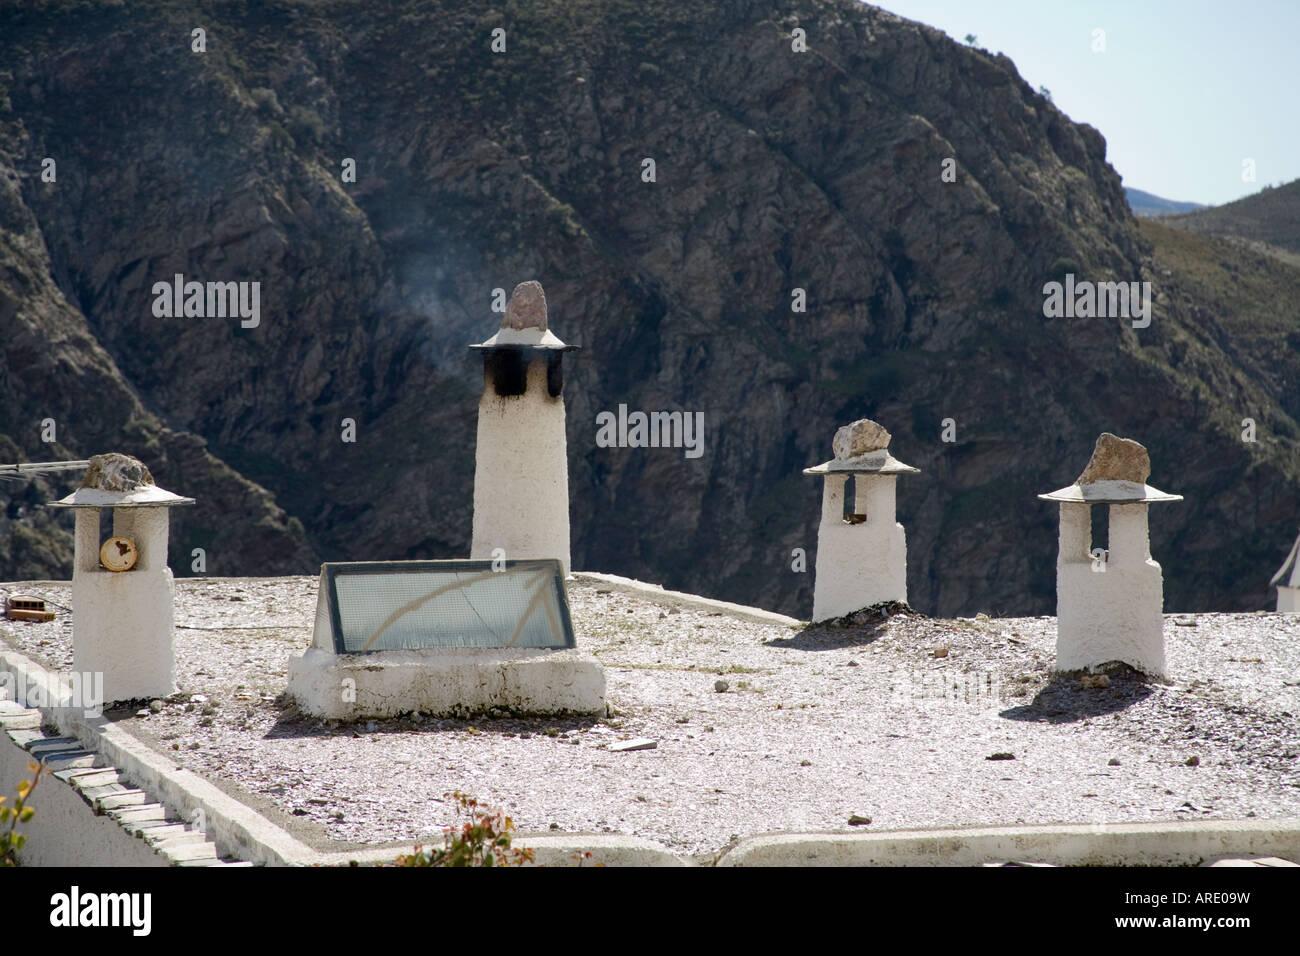 Andalucian Chimney pots Las Alpujarras Southern Spain - Stock Image